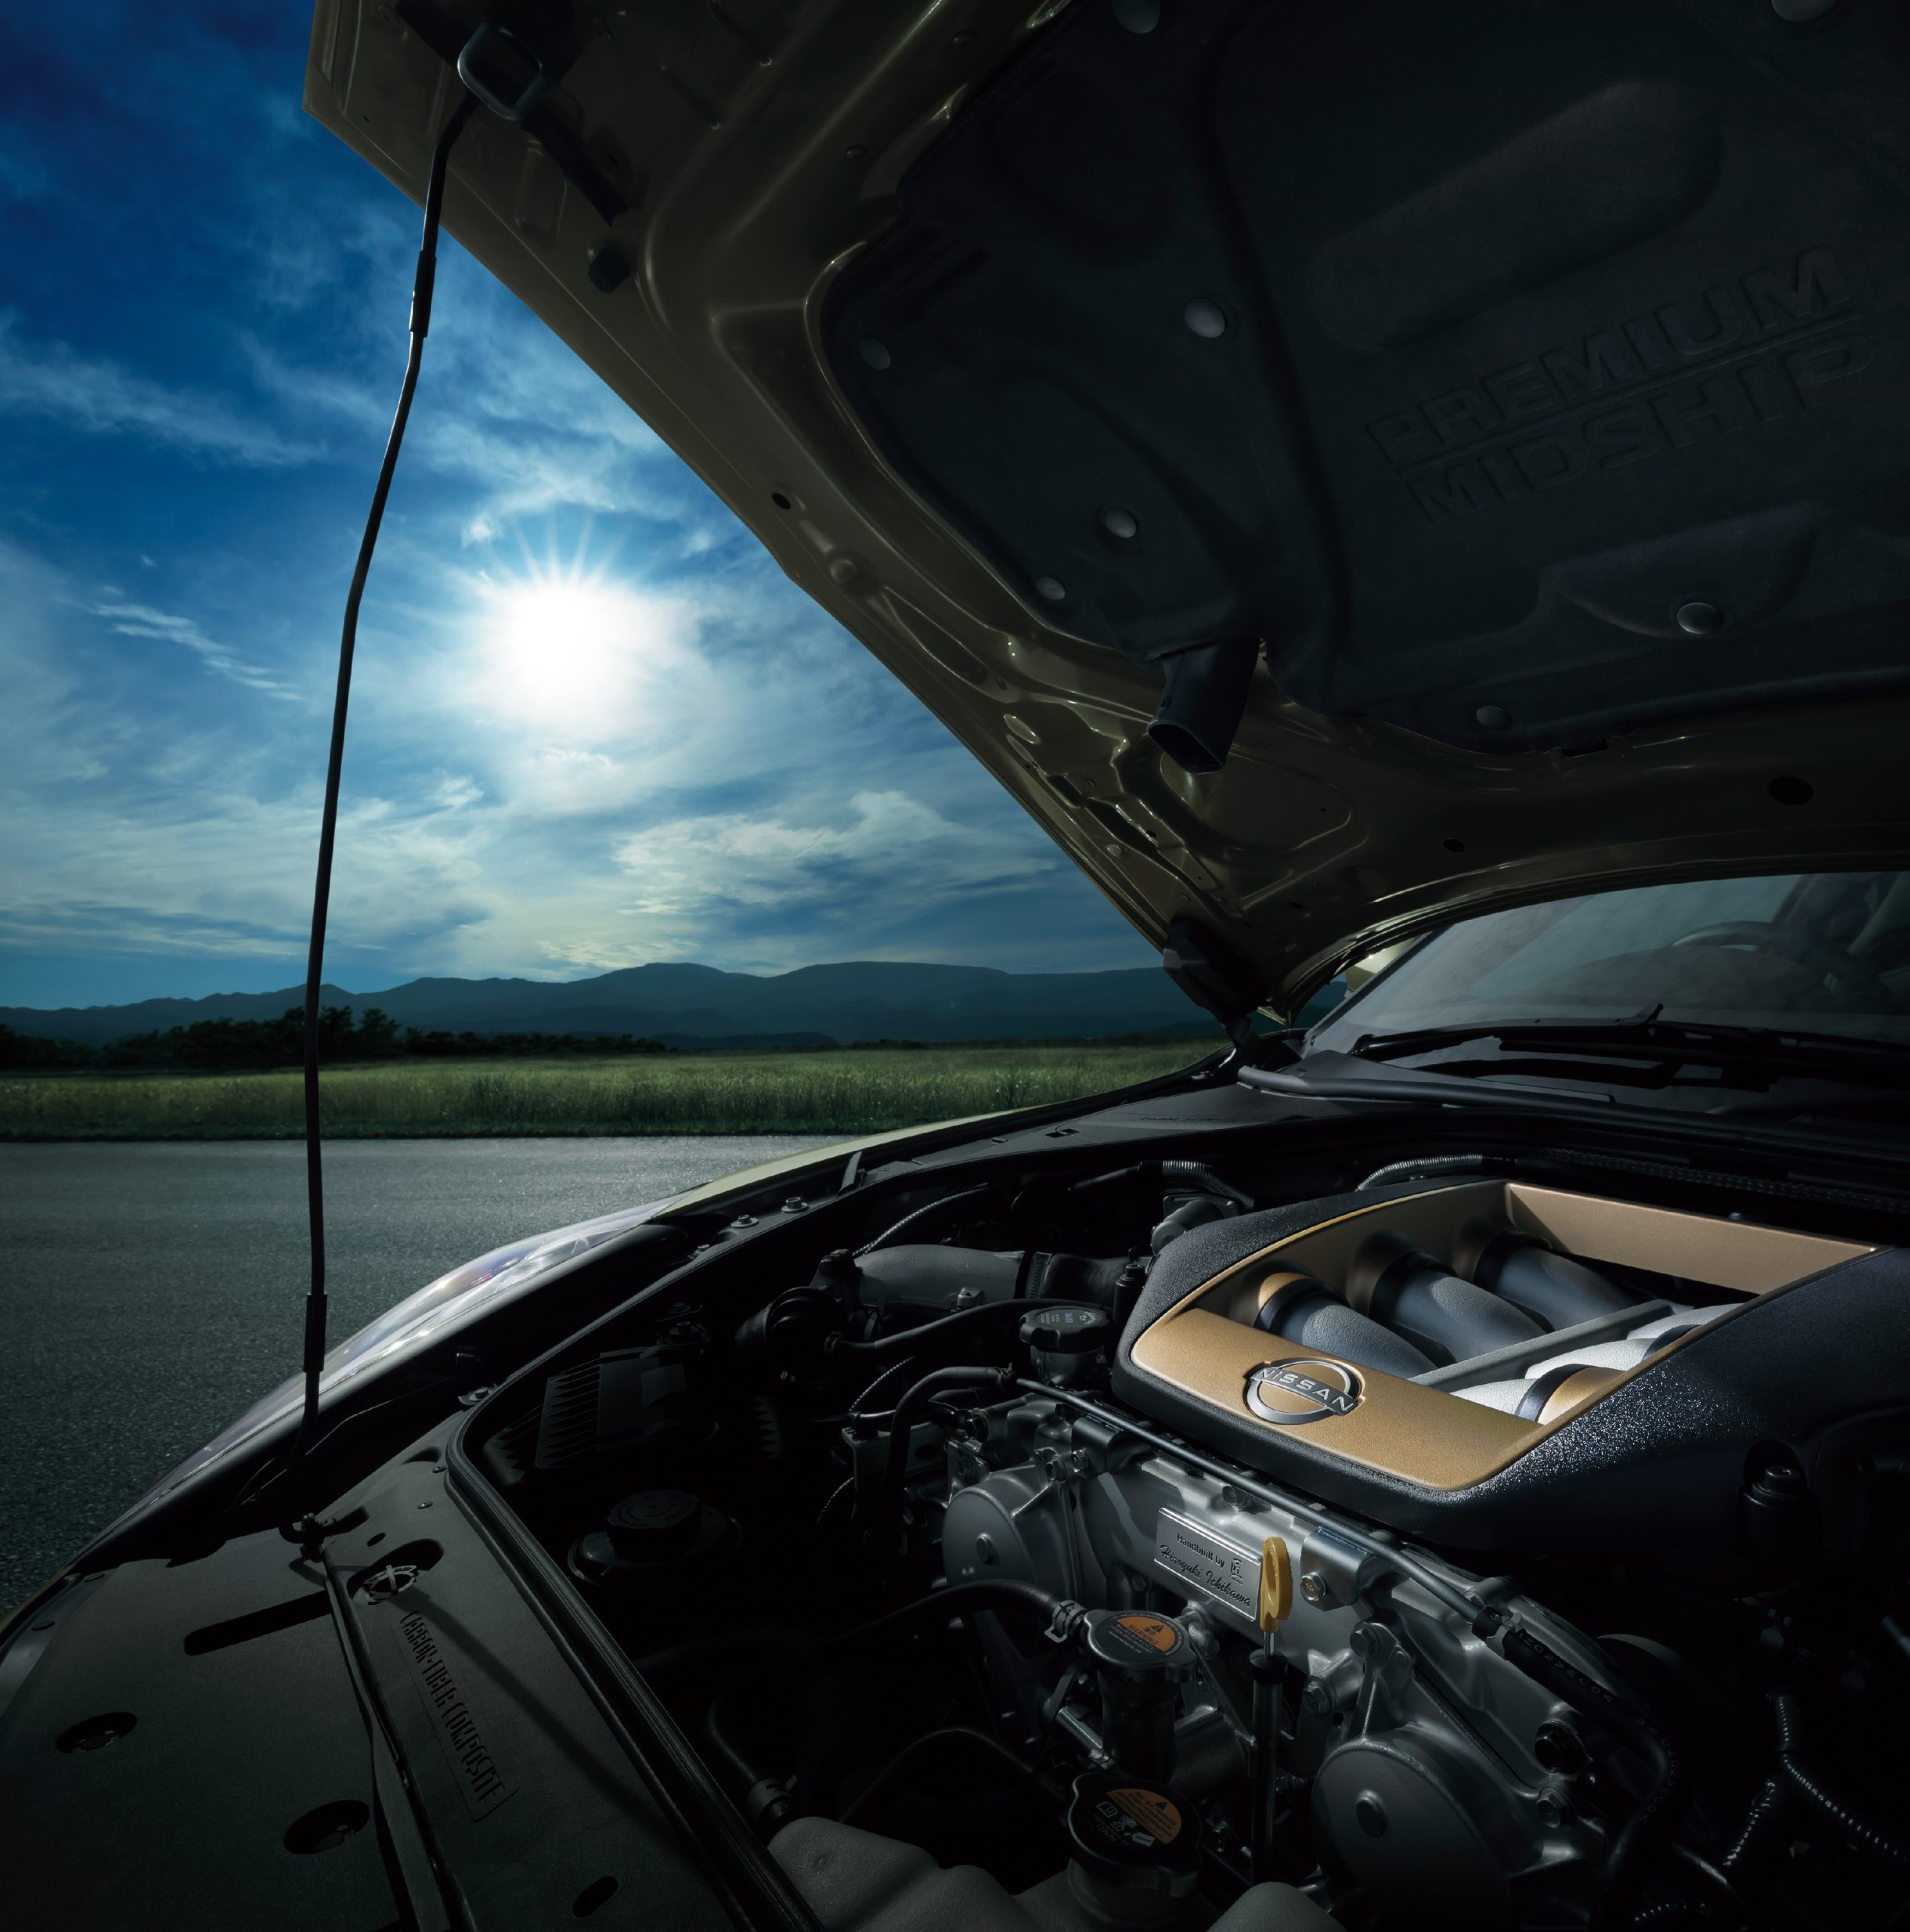 2022 Nissan GT-R Premium T-Spec engine